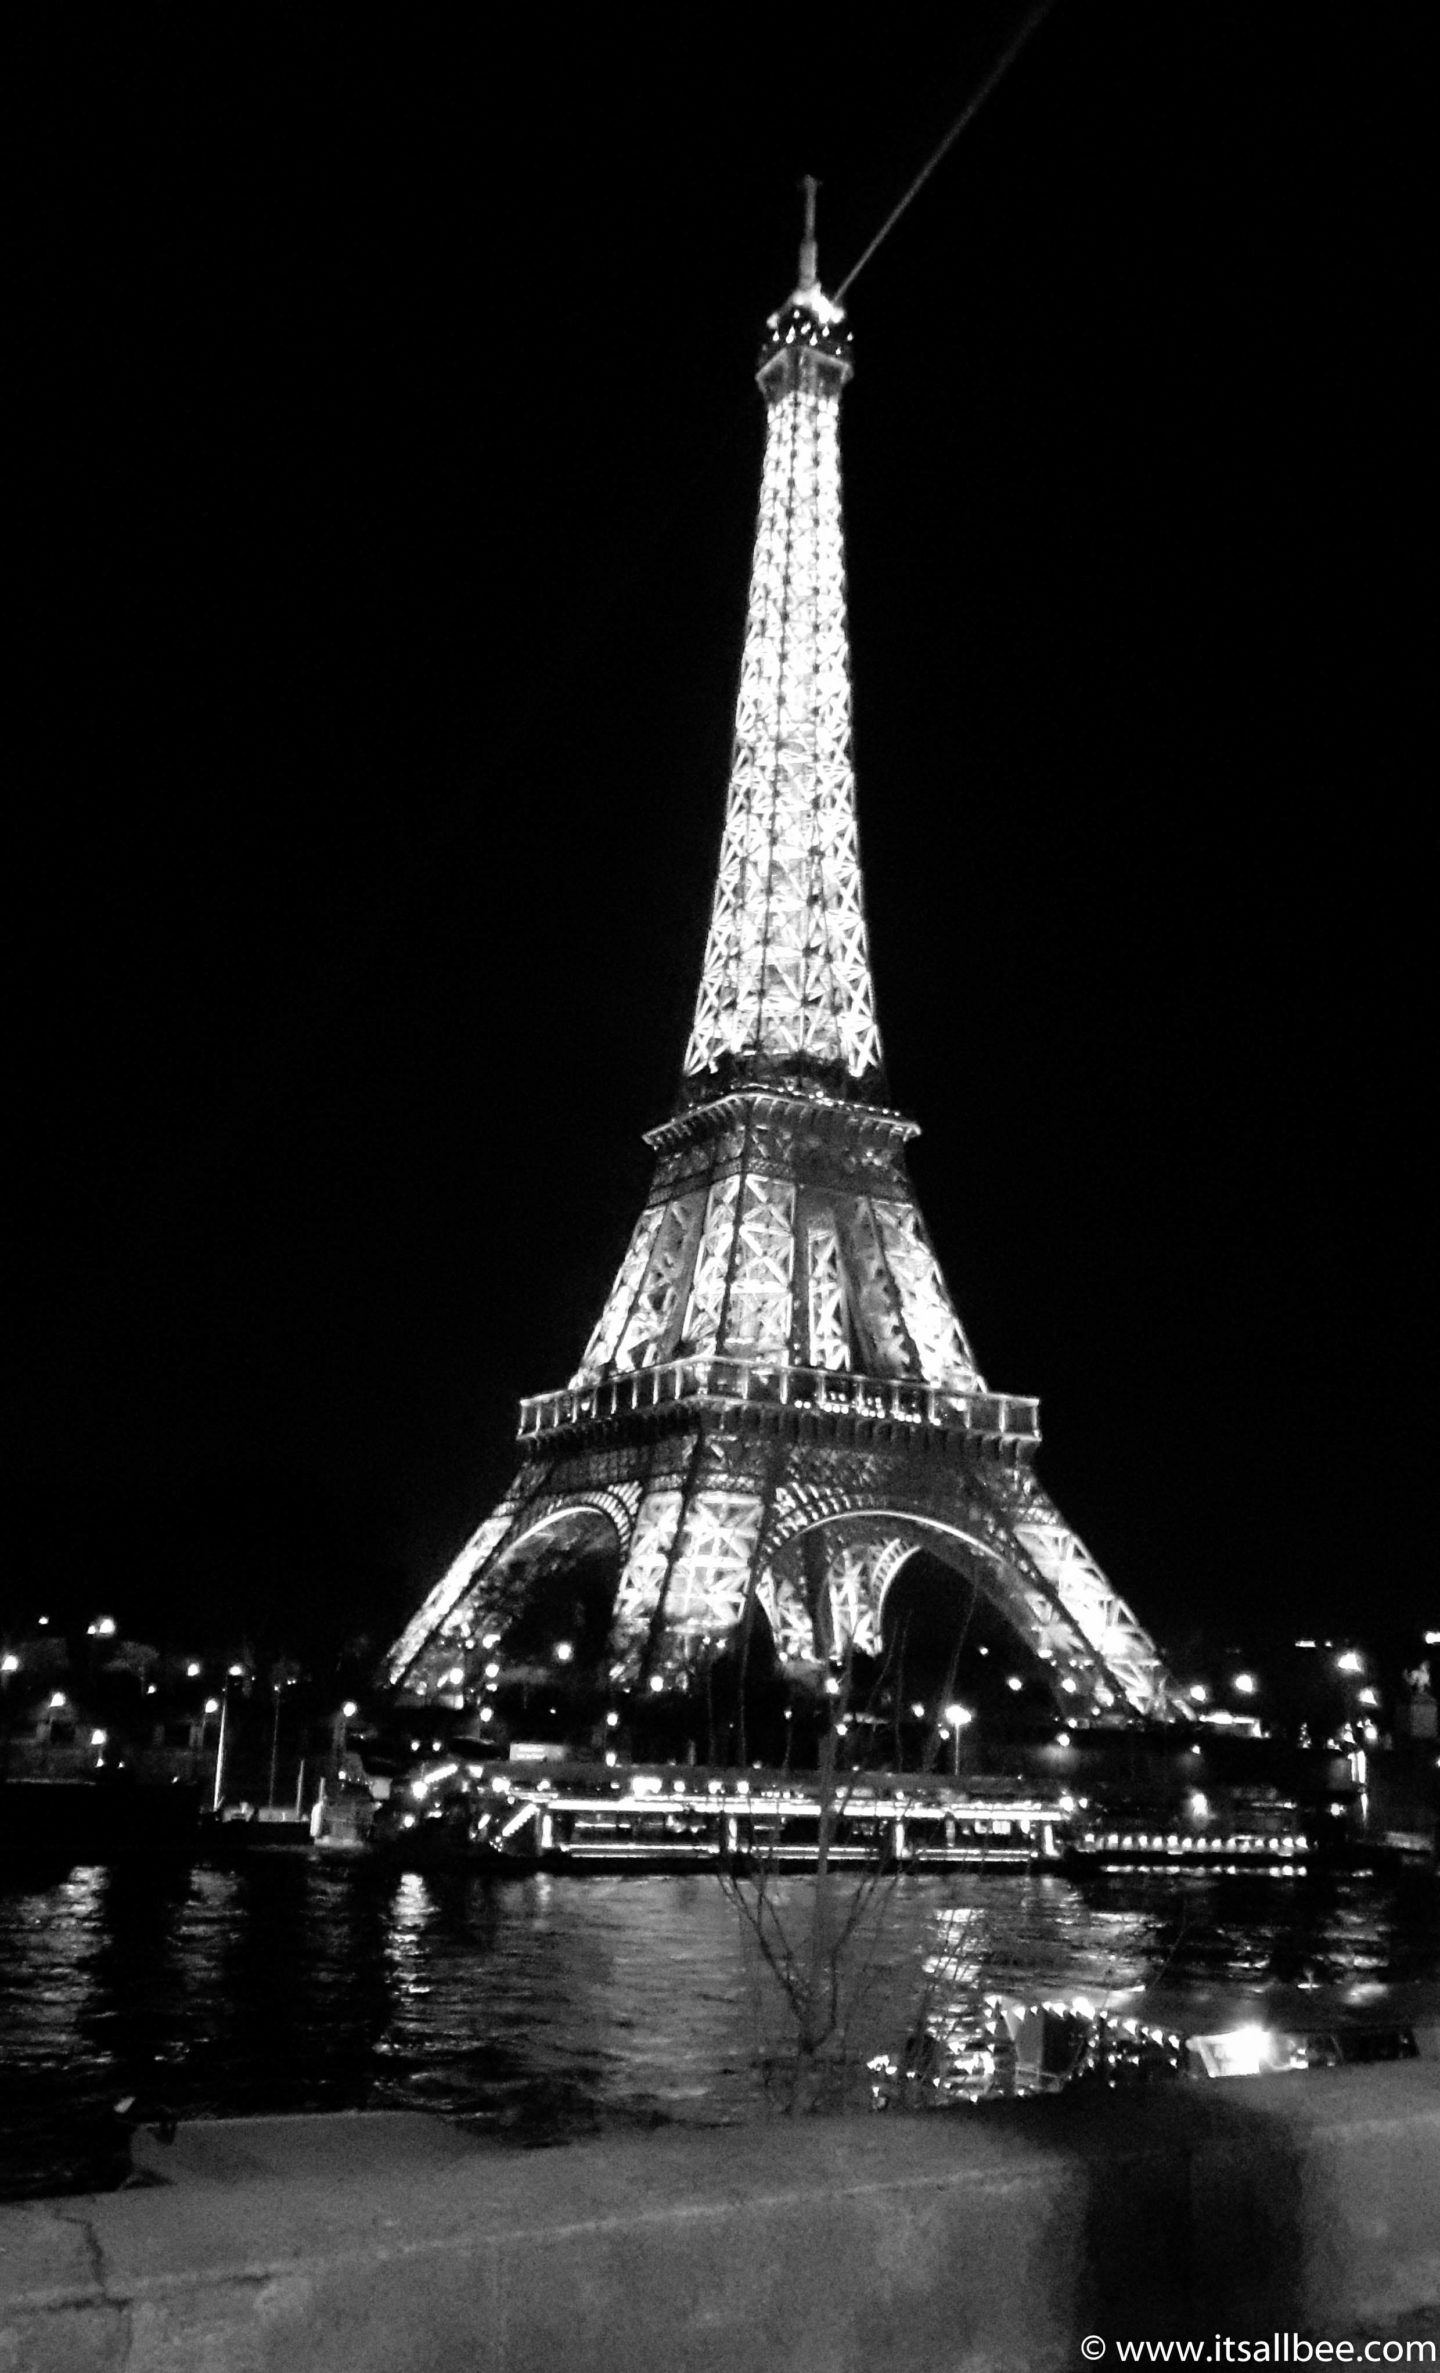 17 Hermosas Imagenes De La Torre Eiffel Eiffel Tower At Night Paris At Night Paris Wallpaper